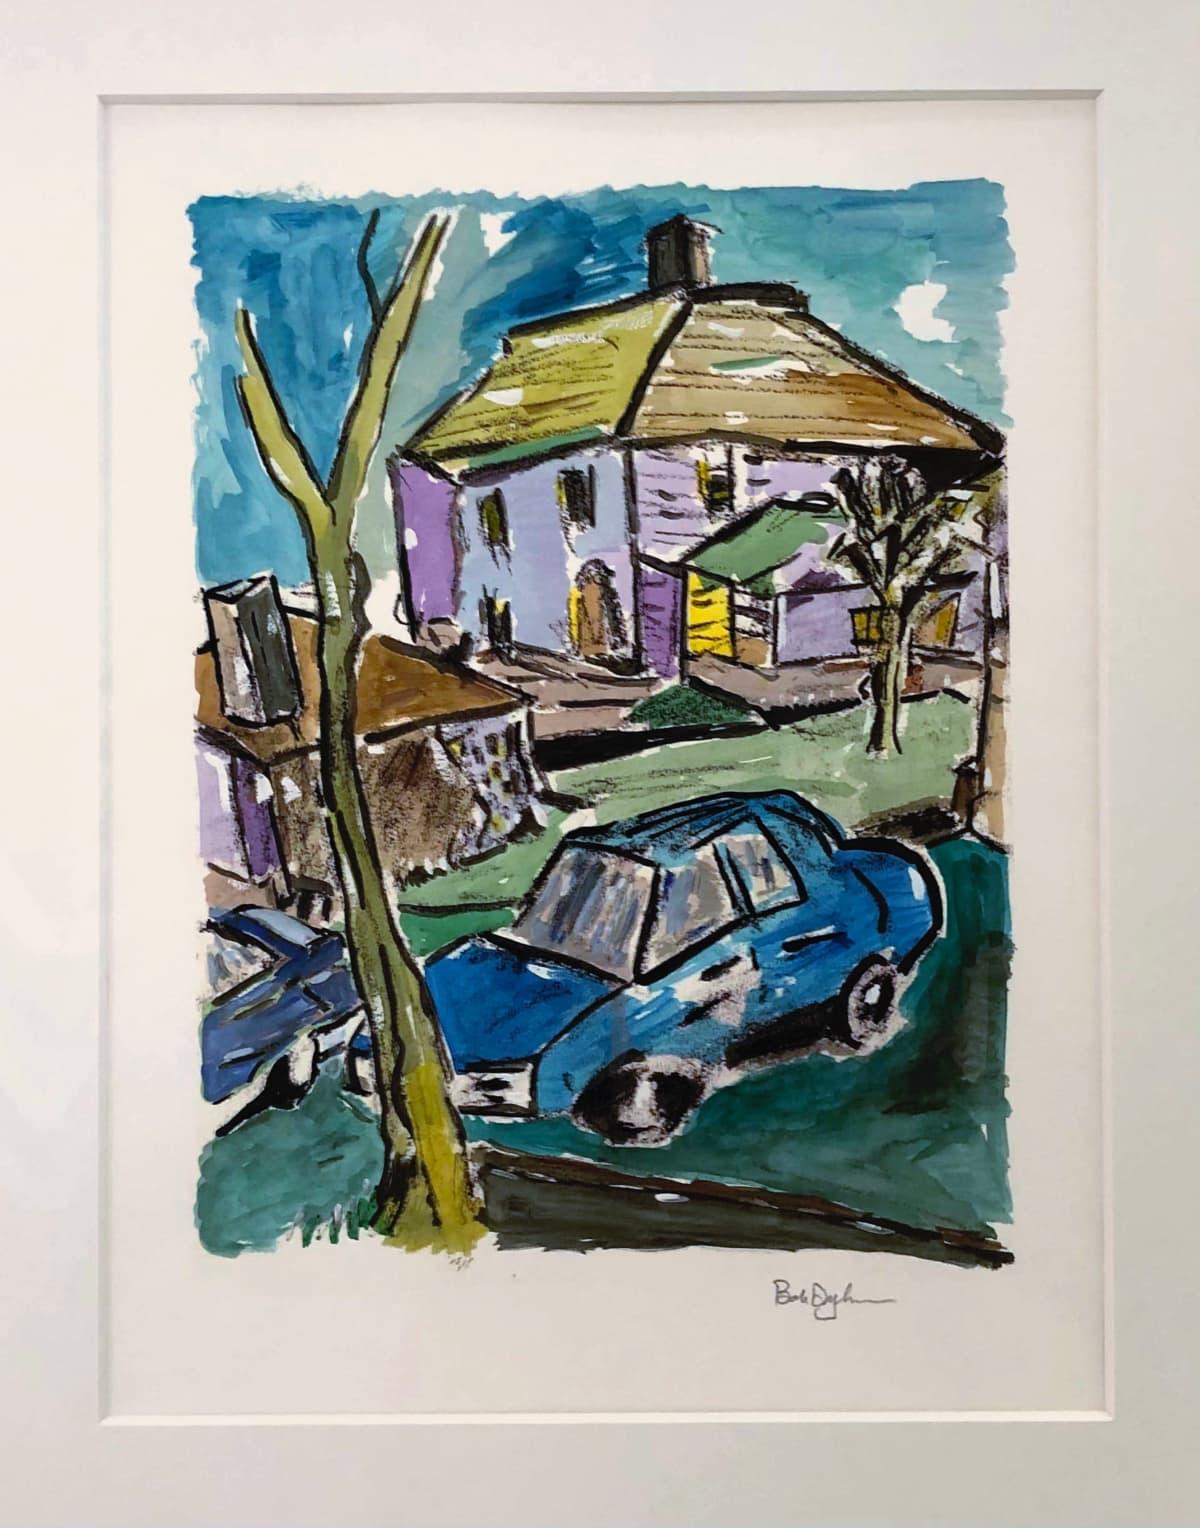 Bob Dylan: Backyard